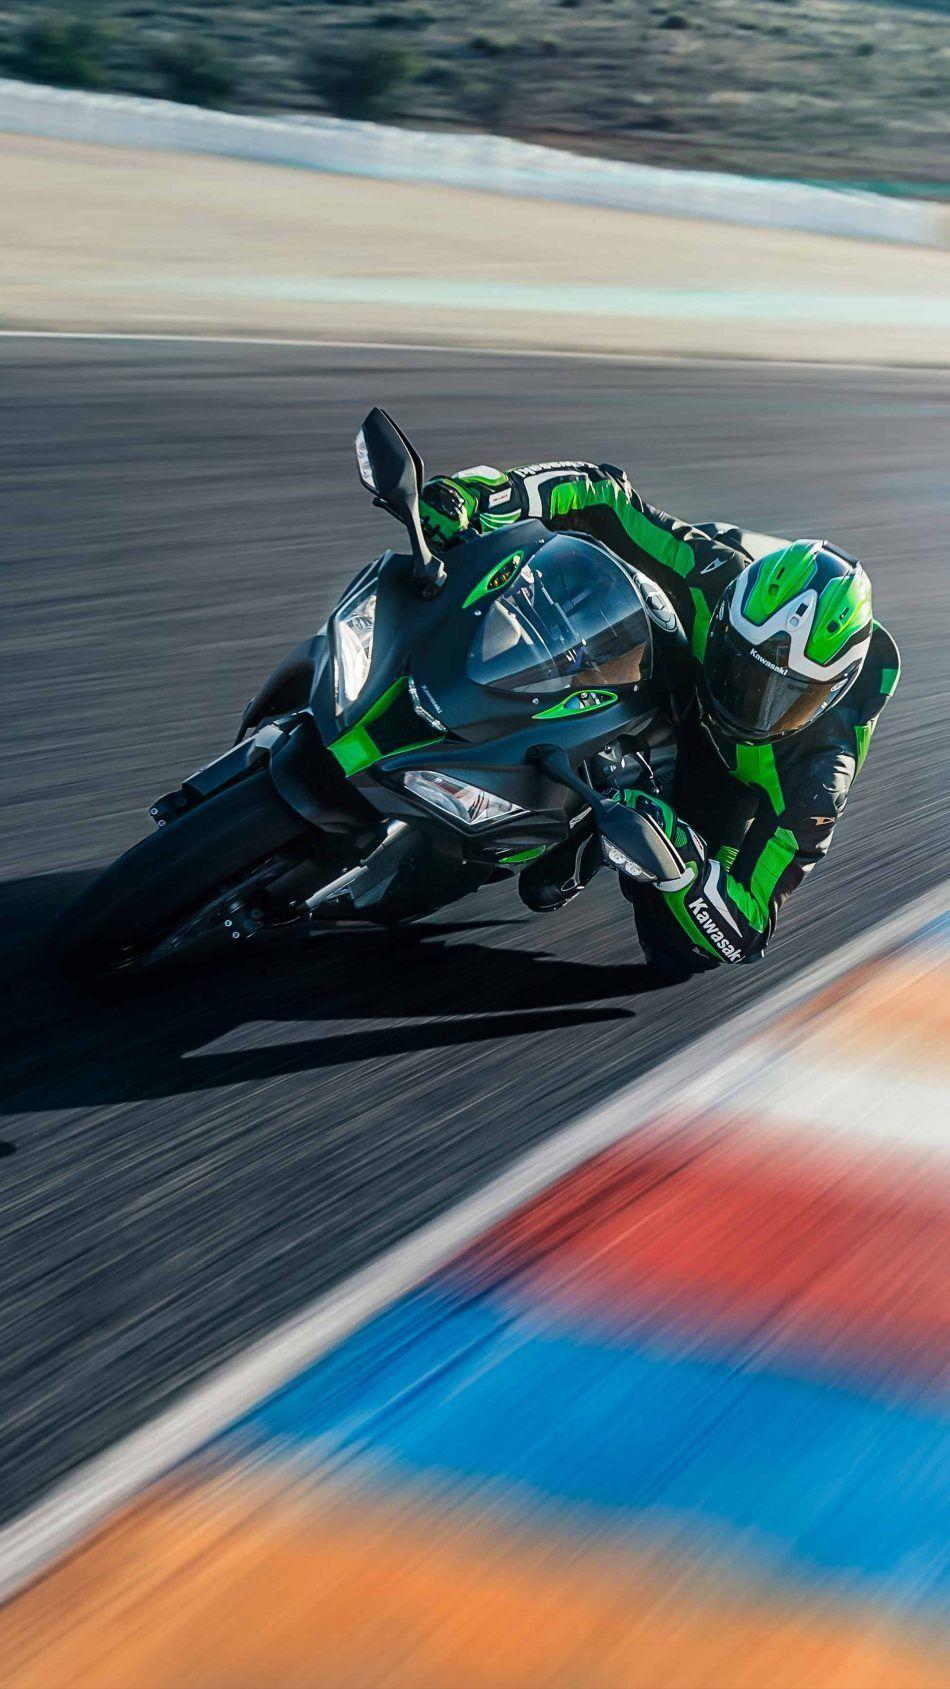 Iphone 10r Wallpaper Find Your Wallpaper Kawasaki Ninja Motorcycle Wallpaper Cafe Racer Motorcycle